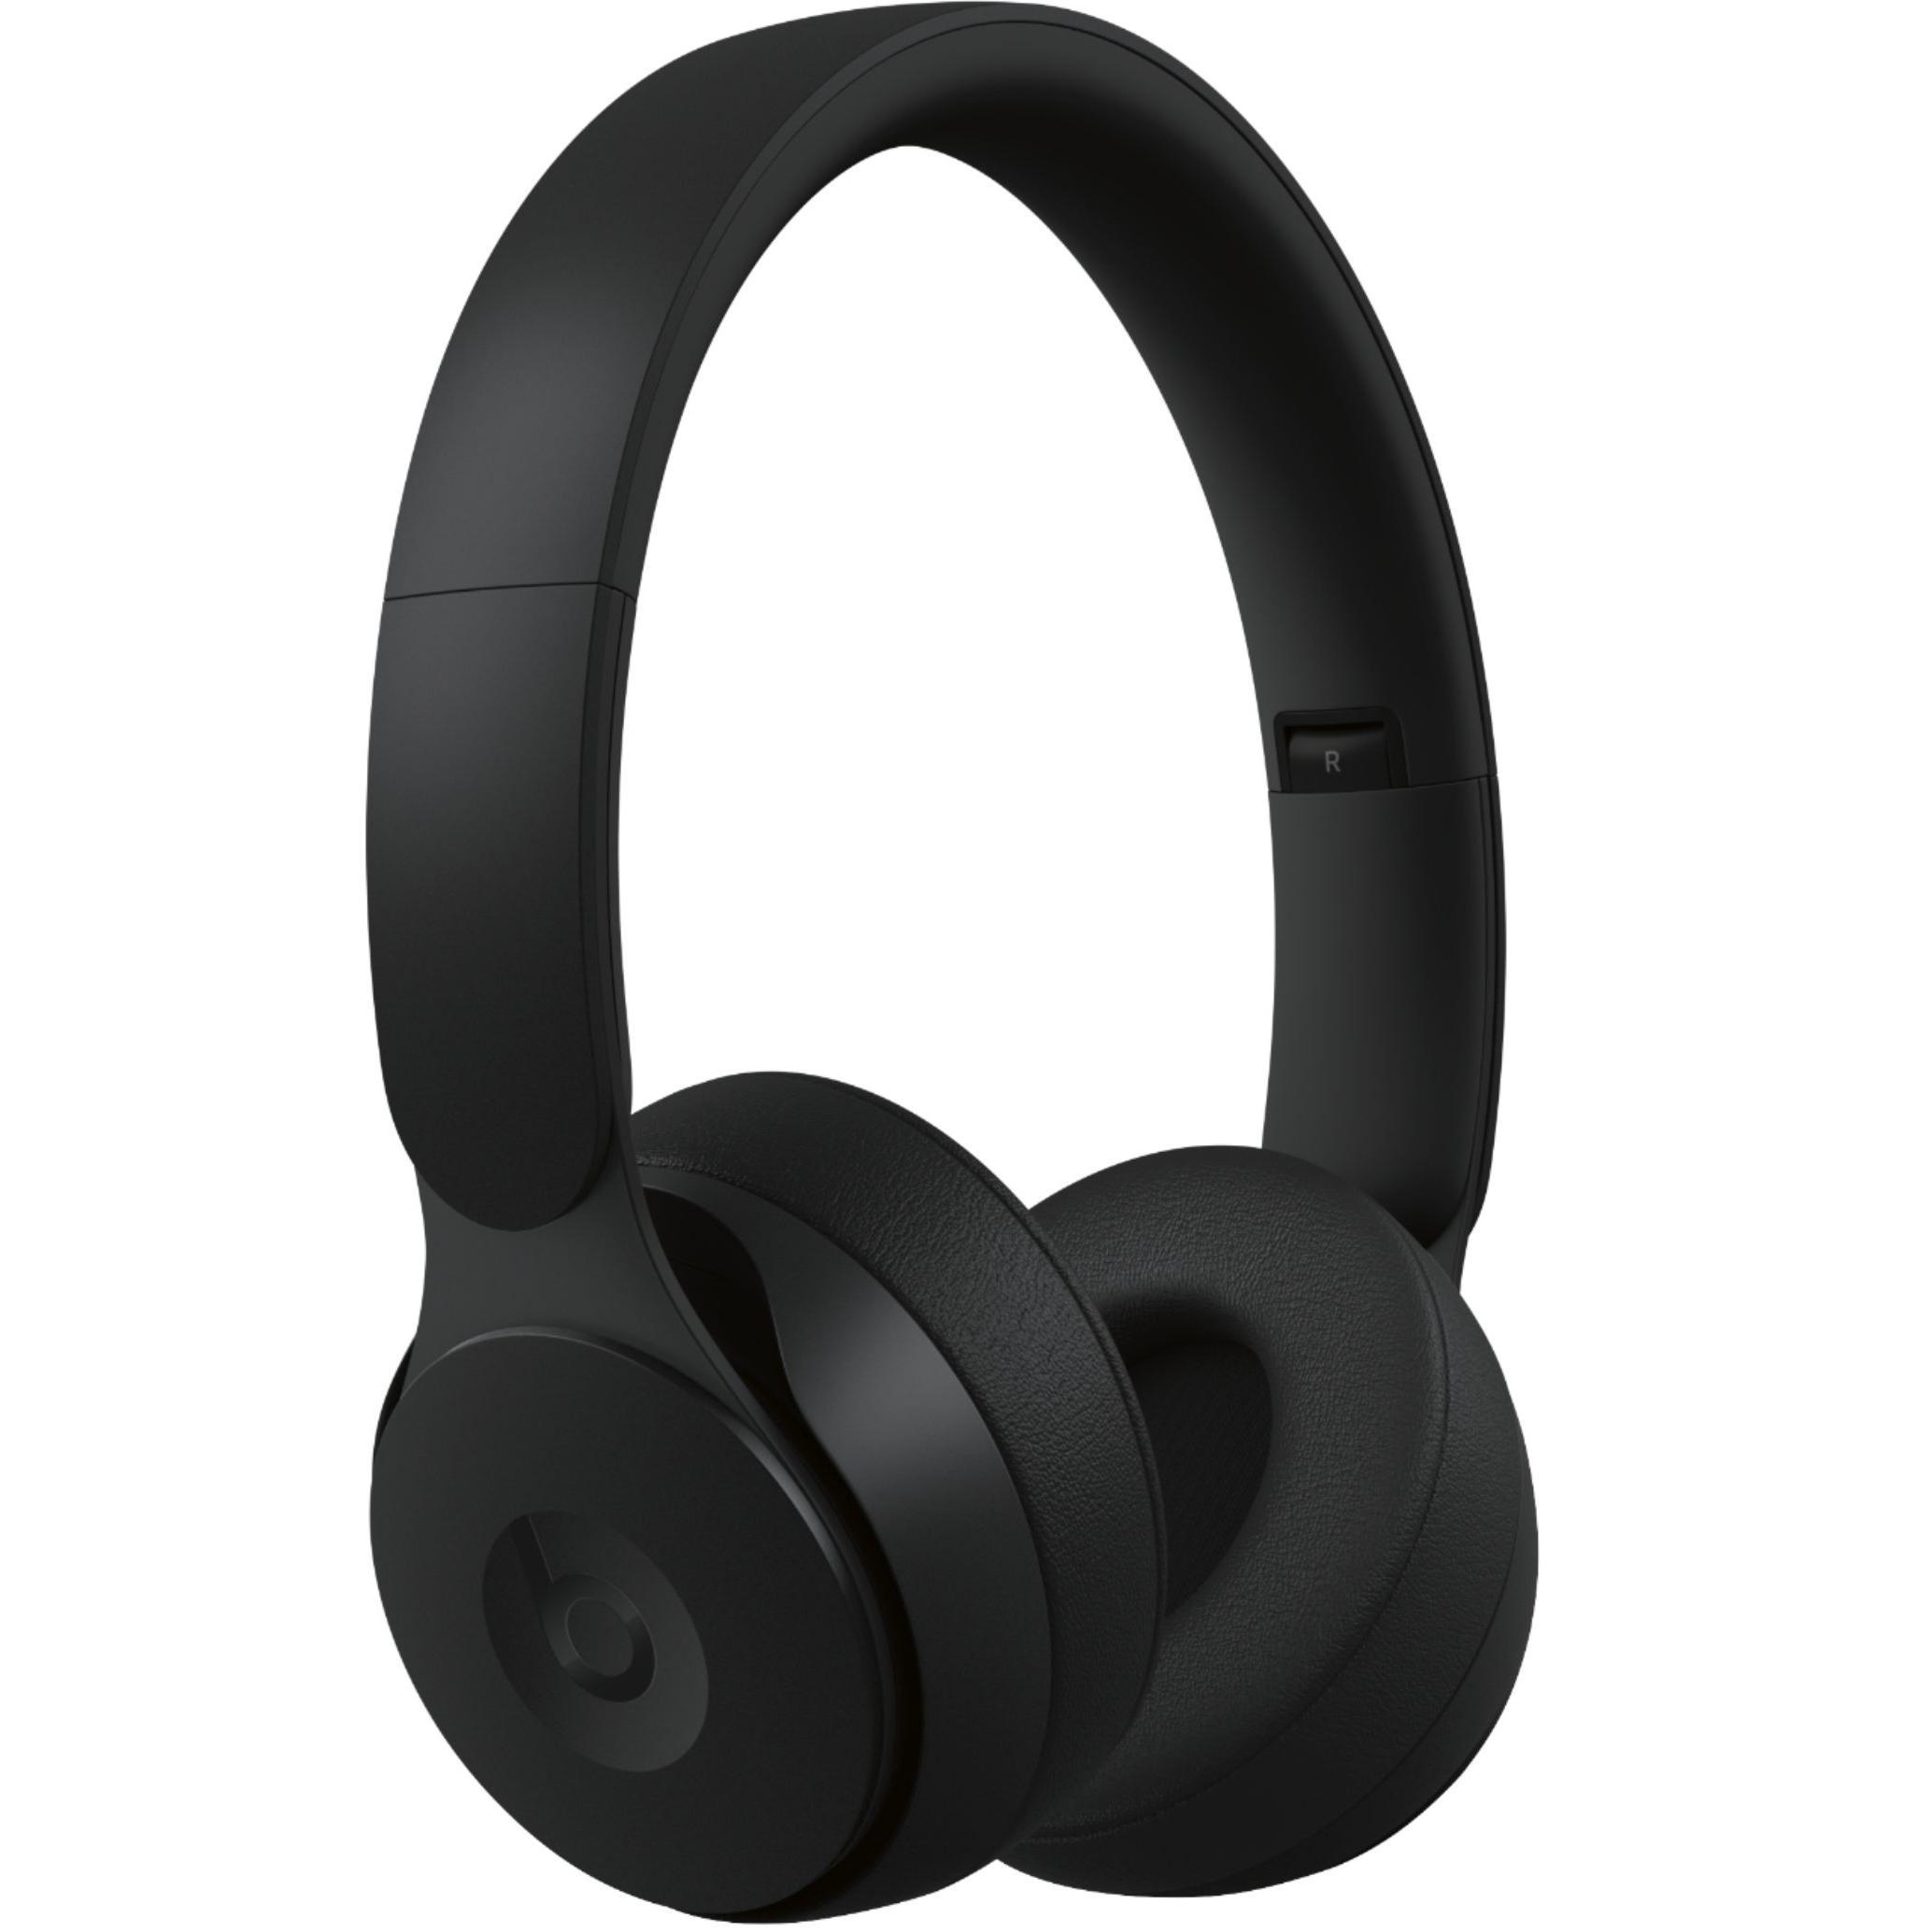 Beats by Dr. Dre - Solo Pro Wireless Noise Cancelling On-Ear Headphones - Matte Black